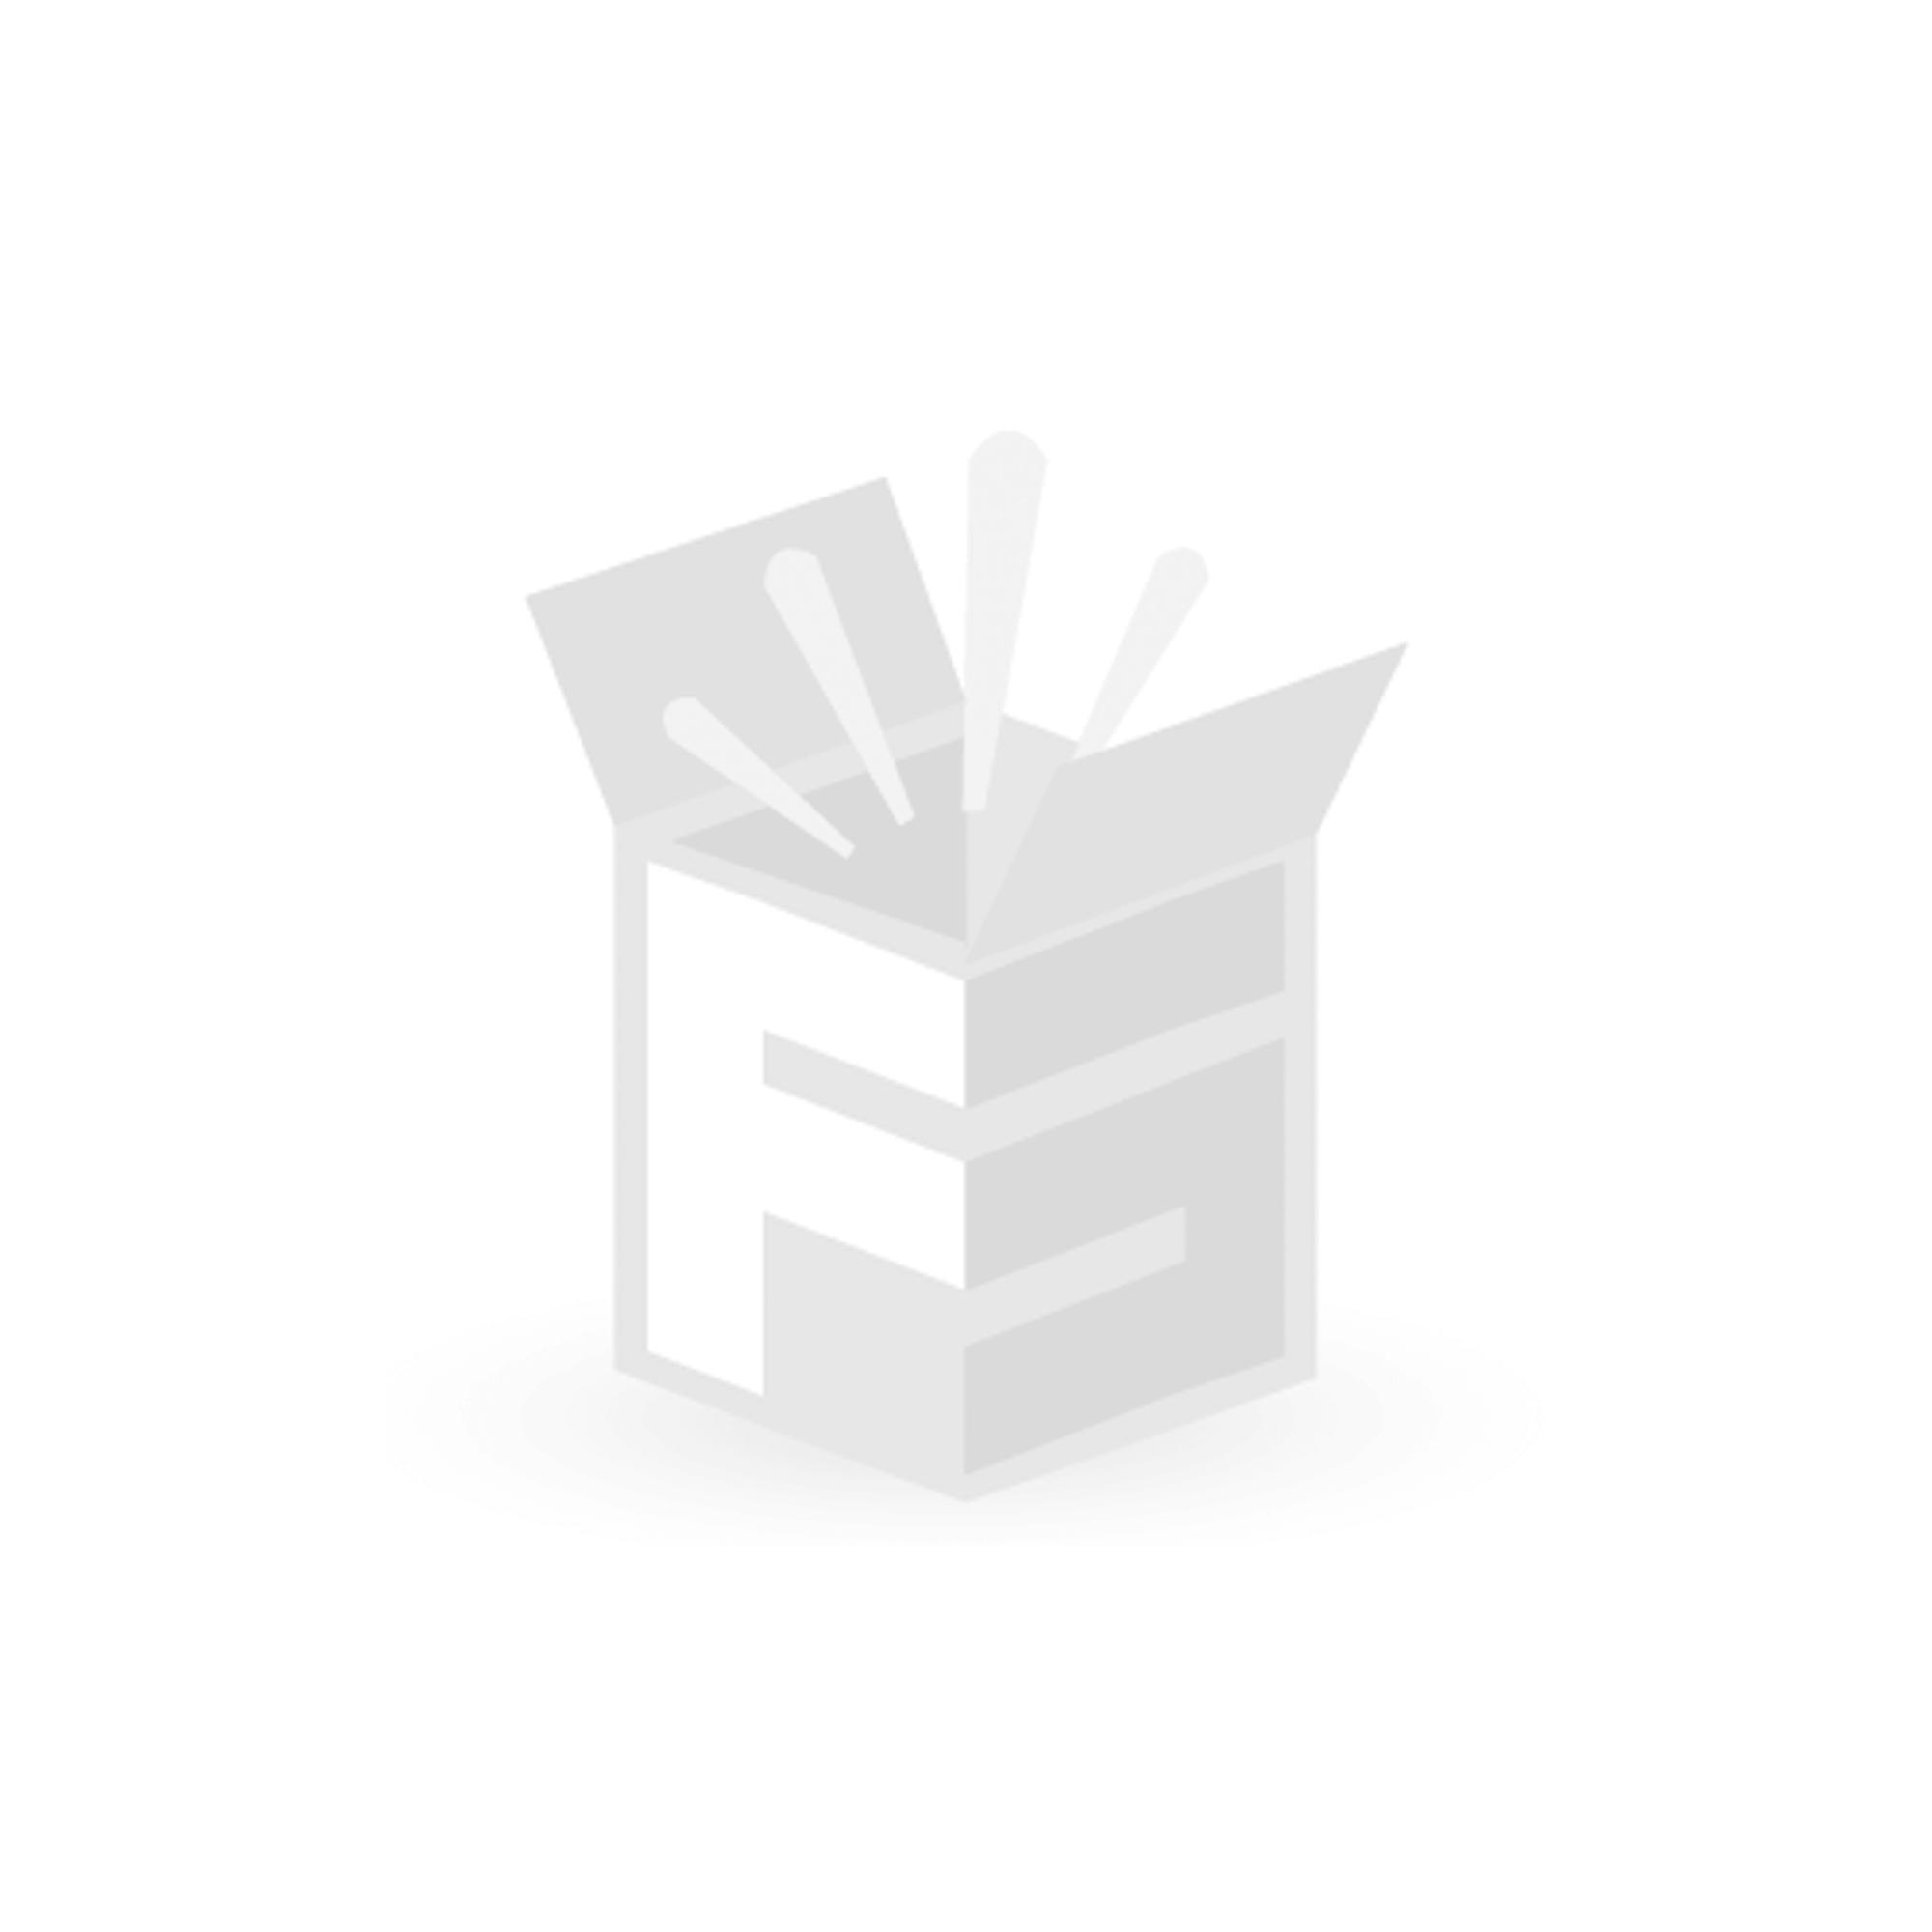 BigSoft Küchenrolle 4 x 50 Blatt, 2-lagig